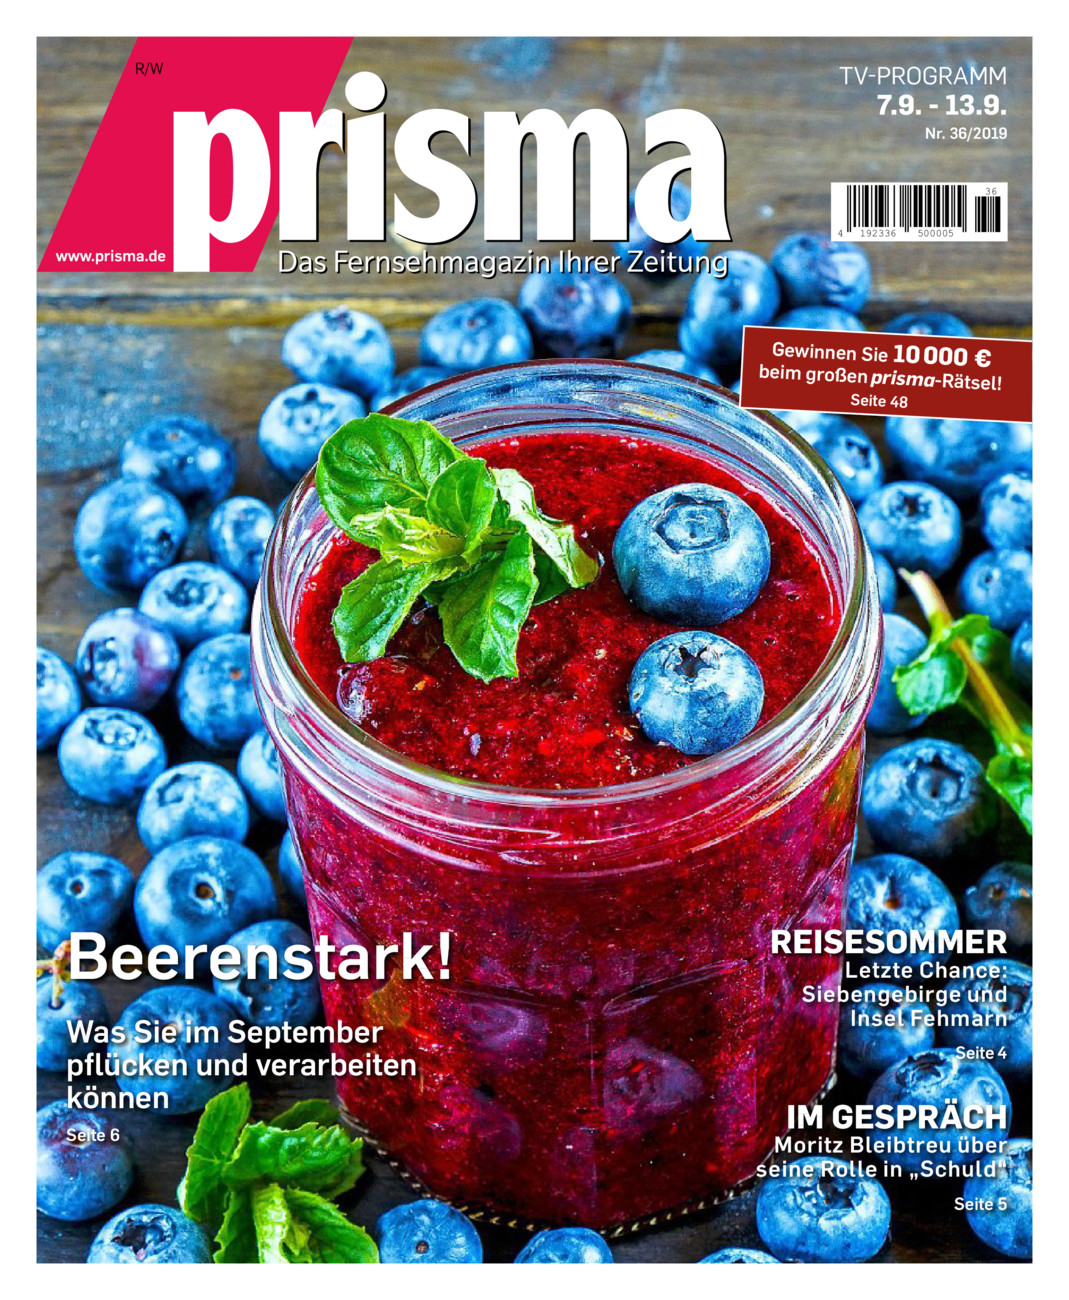 Prisma 07.09. - 13.09.